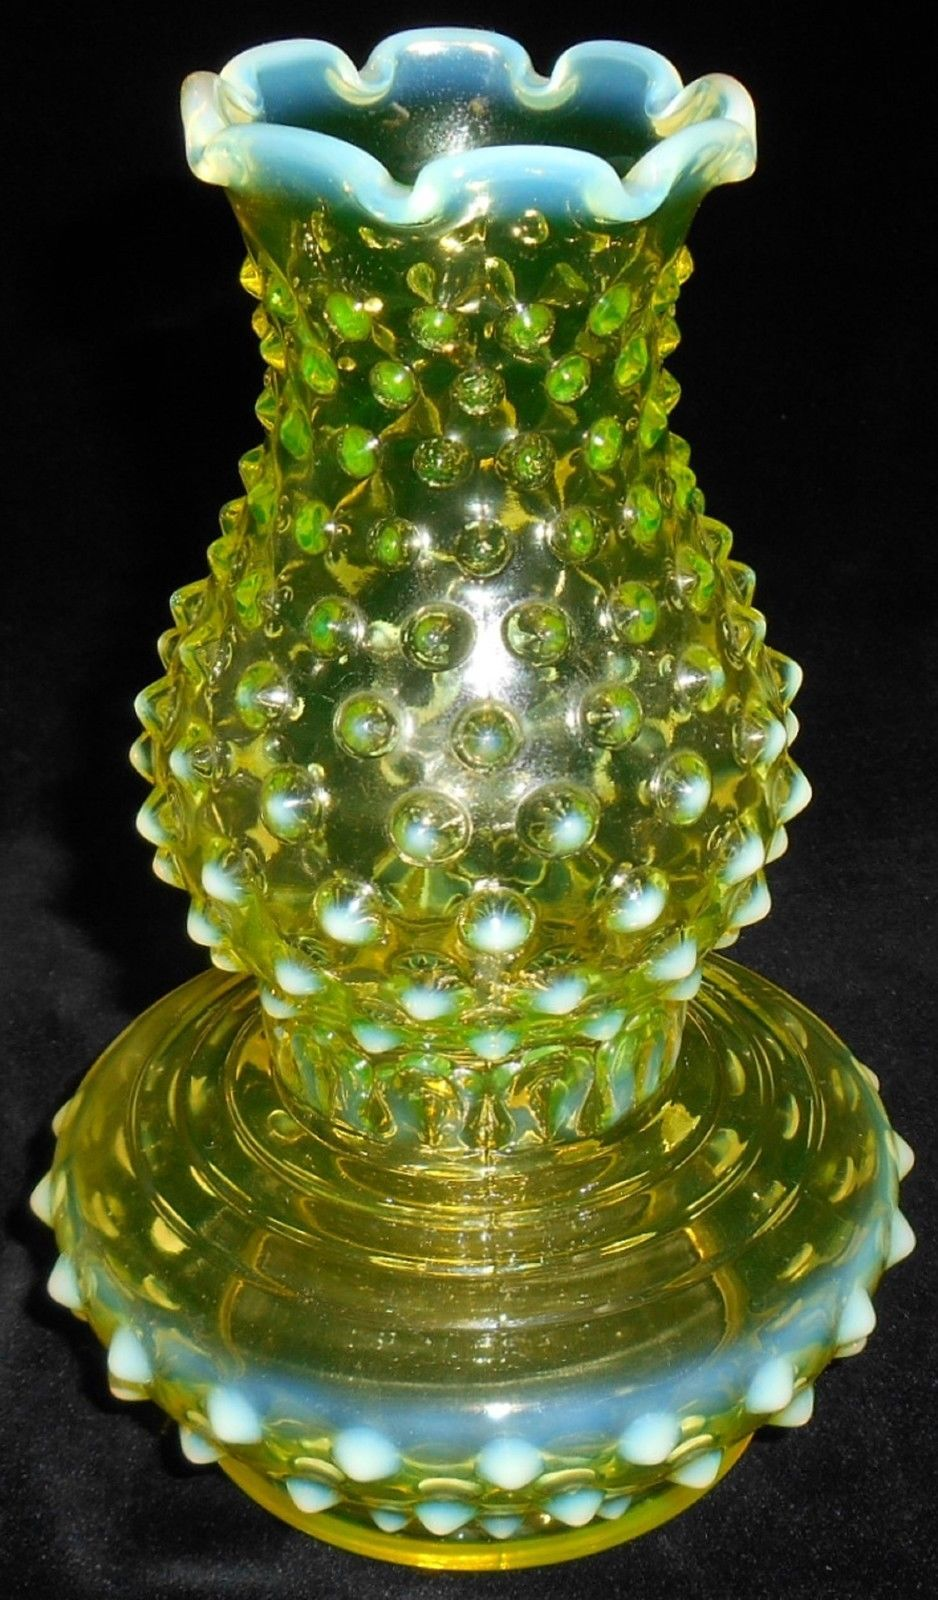 Imperial hobnail uranium glass vase shaped like a hurricane lamp imperial hobnail uranium glass vase shaped like a hurricane lamp reviewsmspy